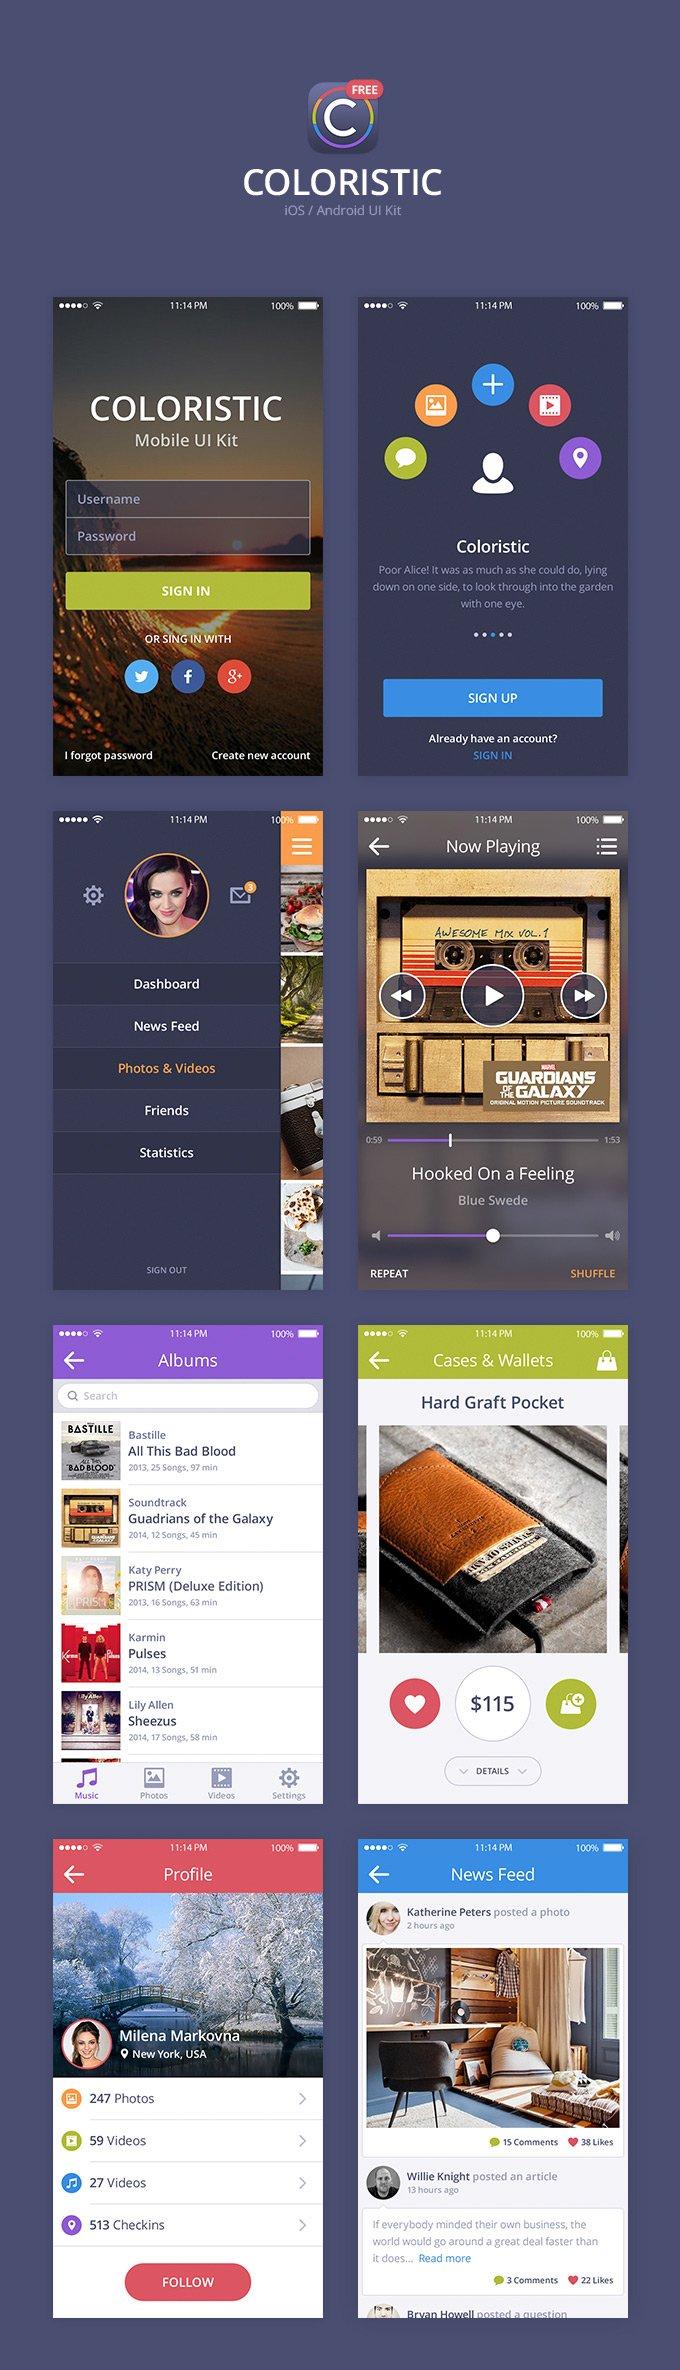 Coloristic UI Kit mobile app (.Psd) скачать бесплатно